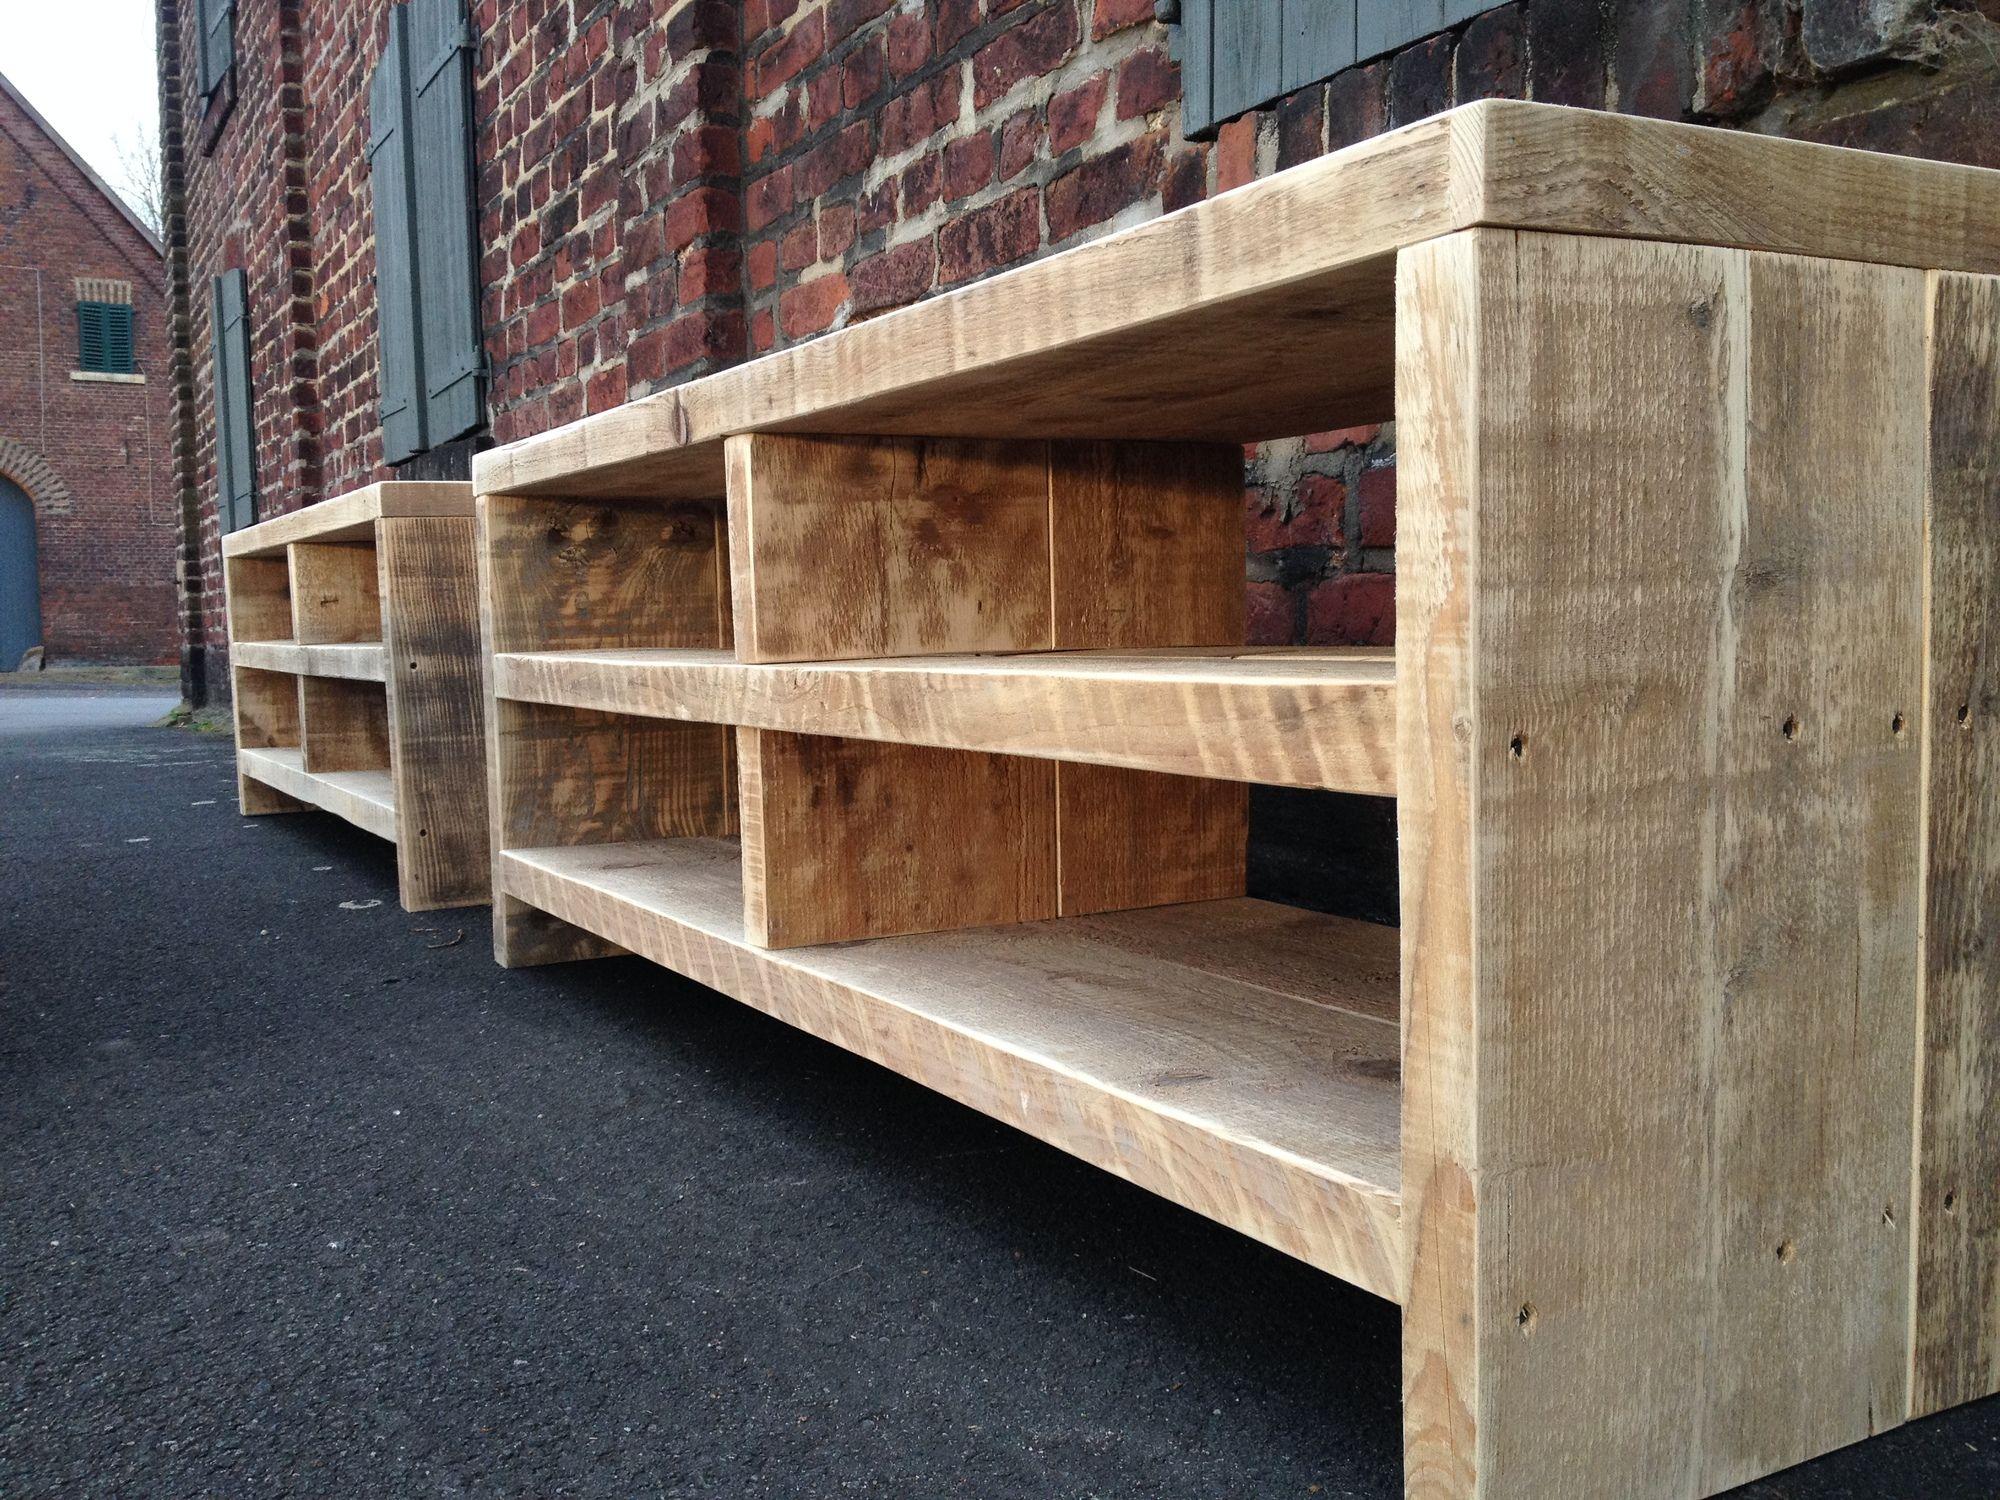 Tv bank weinkisten  Genial hifi möbel massivholz | Möbel | Pinterest | Hifi möbel ...